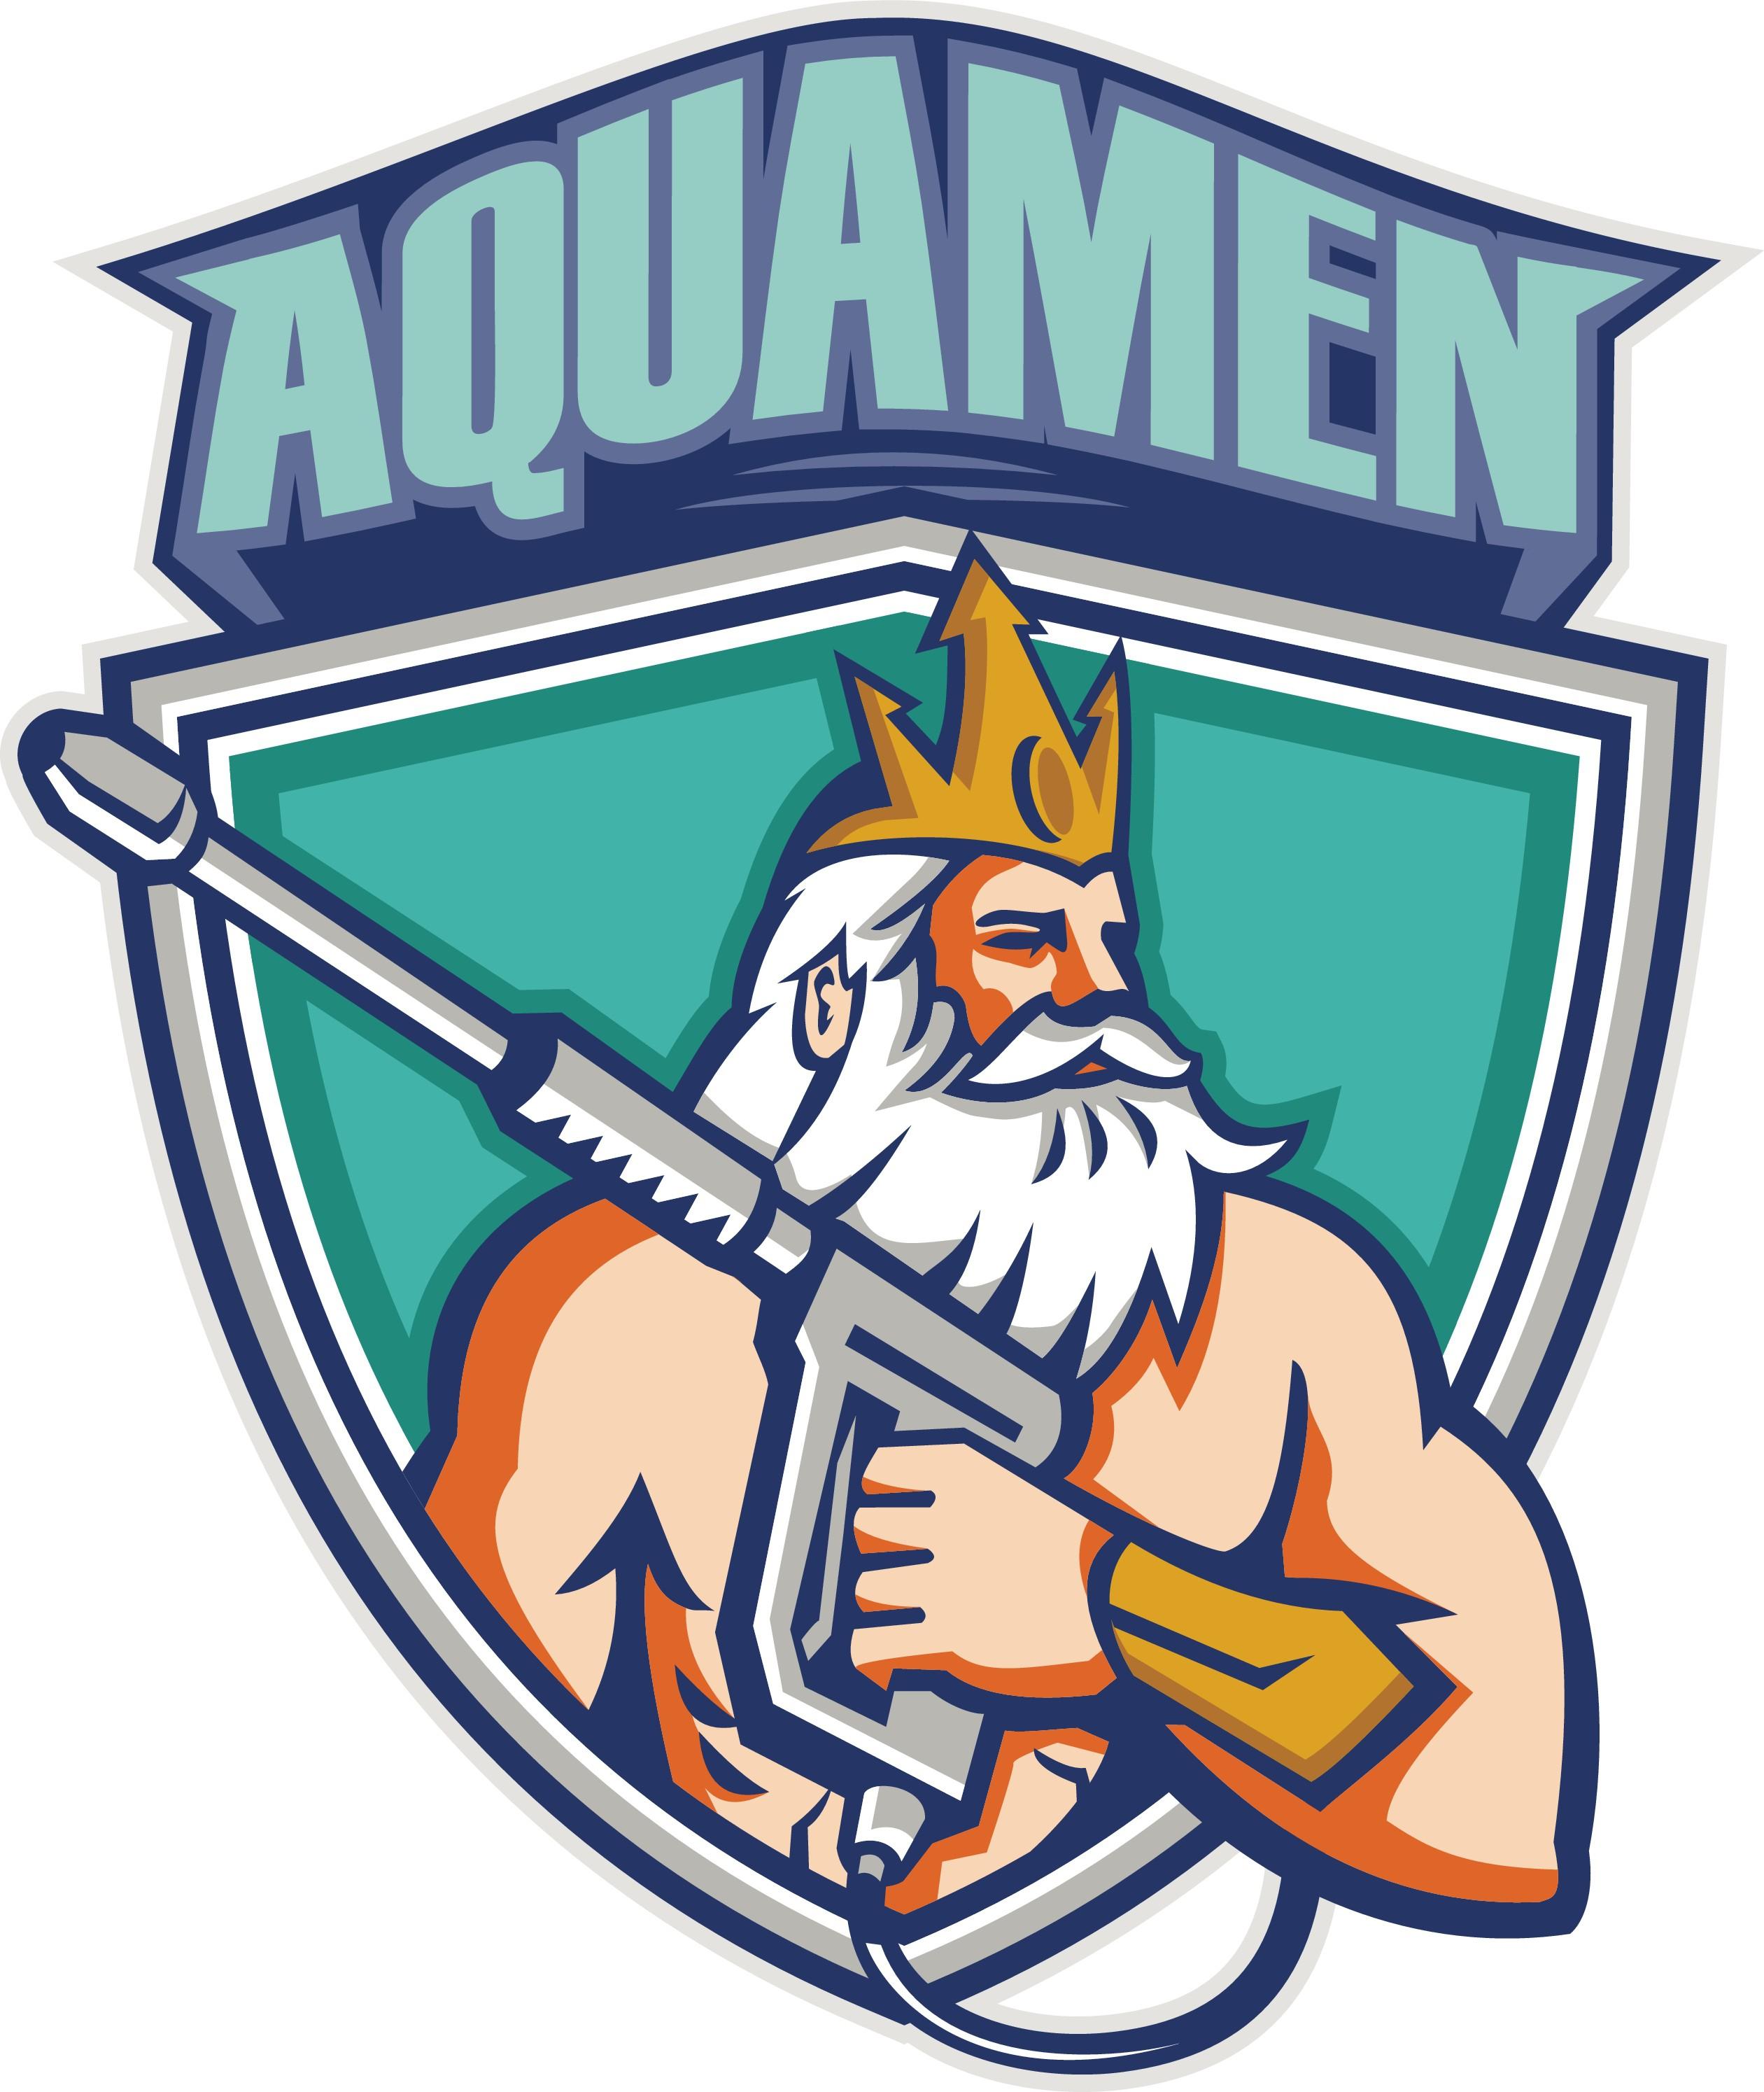 AQUA MEN!  Create a unique logo for a Pressure Washing Business.